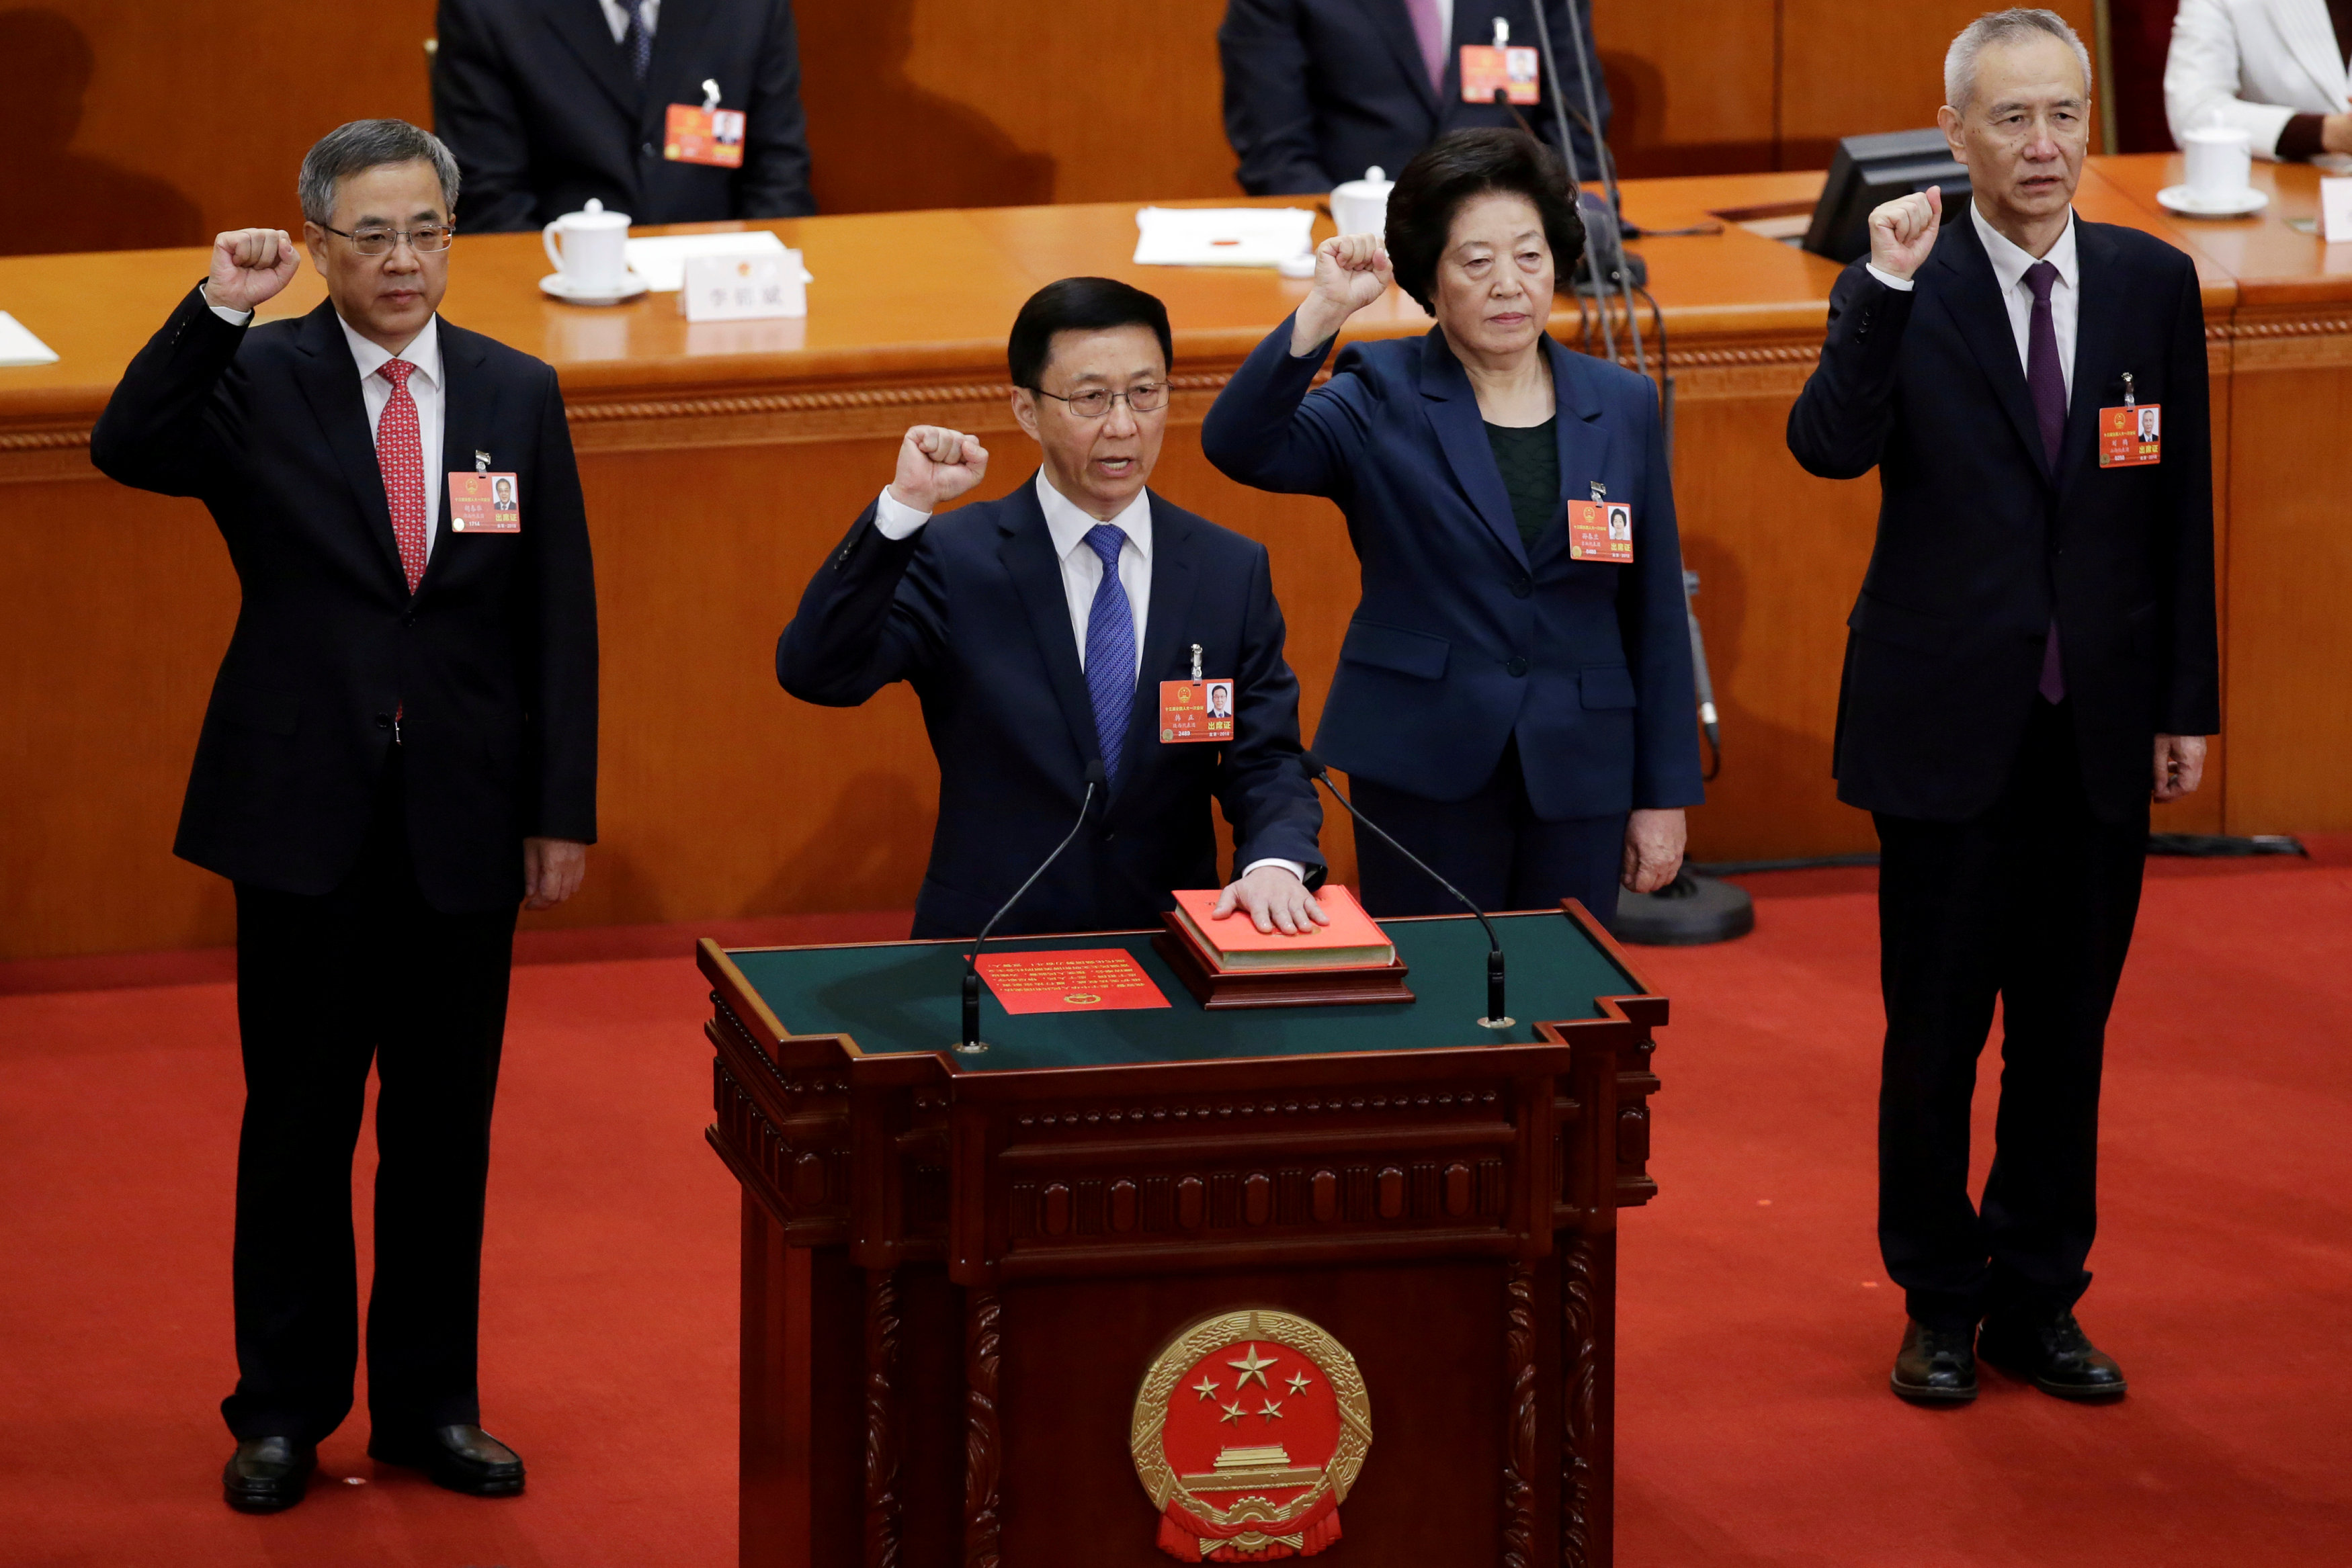 China forms new economic team as Xi Jinping kicks off second term